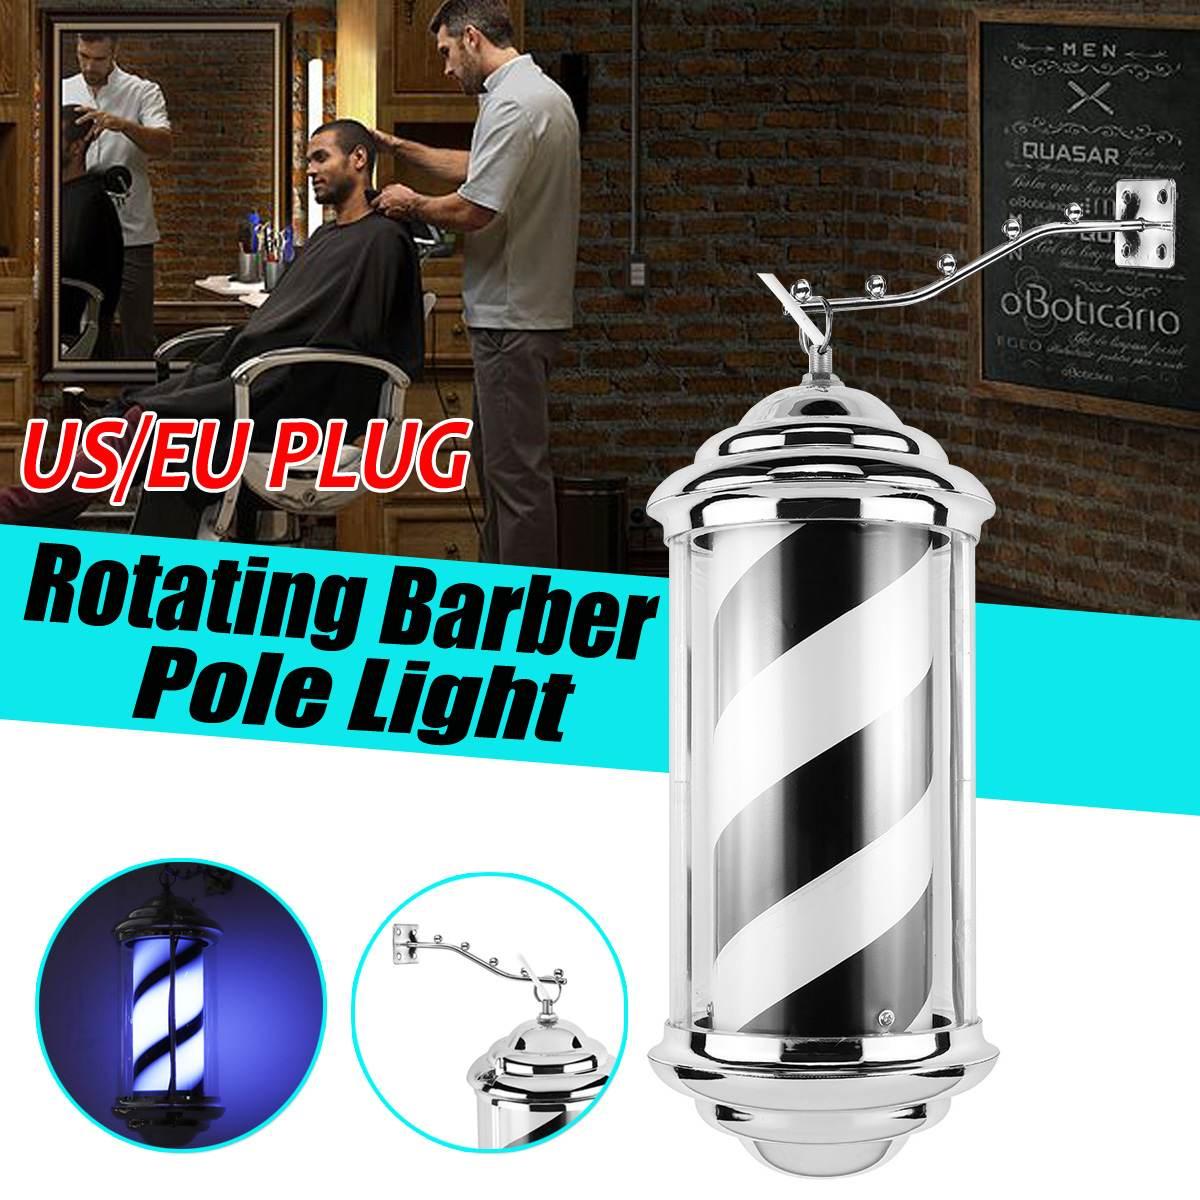 Hair Salon Light Barber Pole Led Light Rotating Light Lamp With Lifting Arm Marker Lamp LED Downlights 220V EU / 110V US Plug